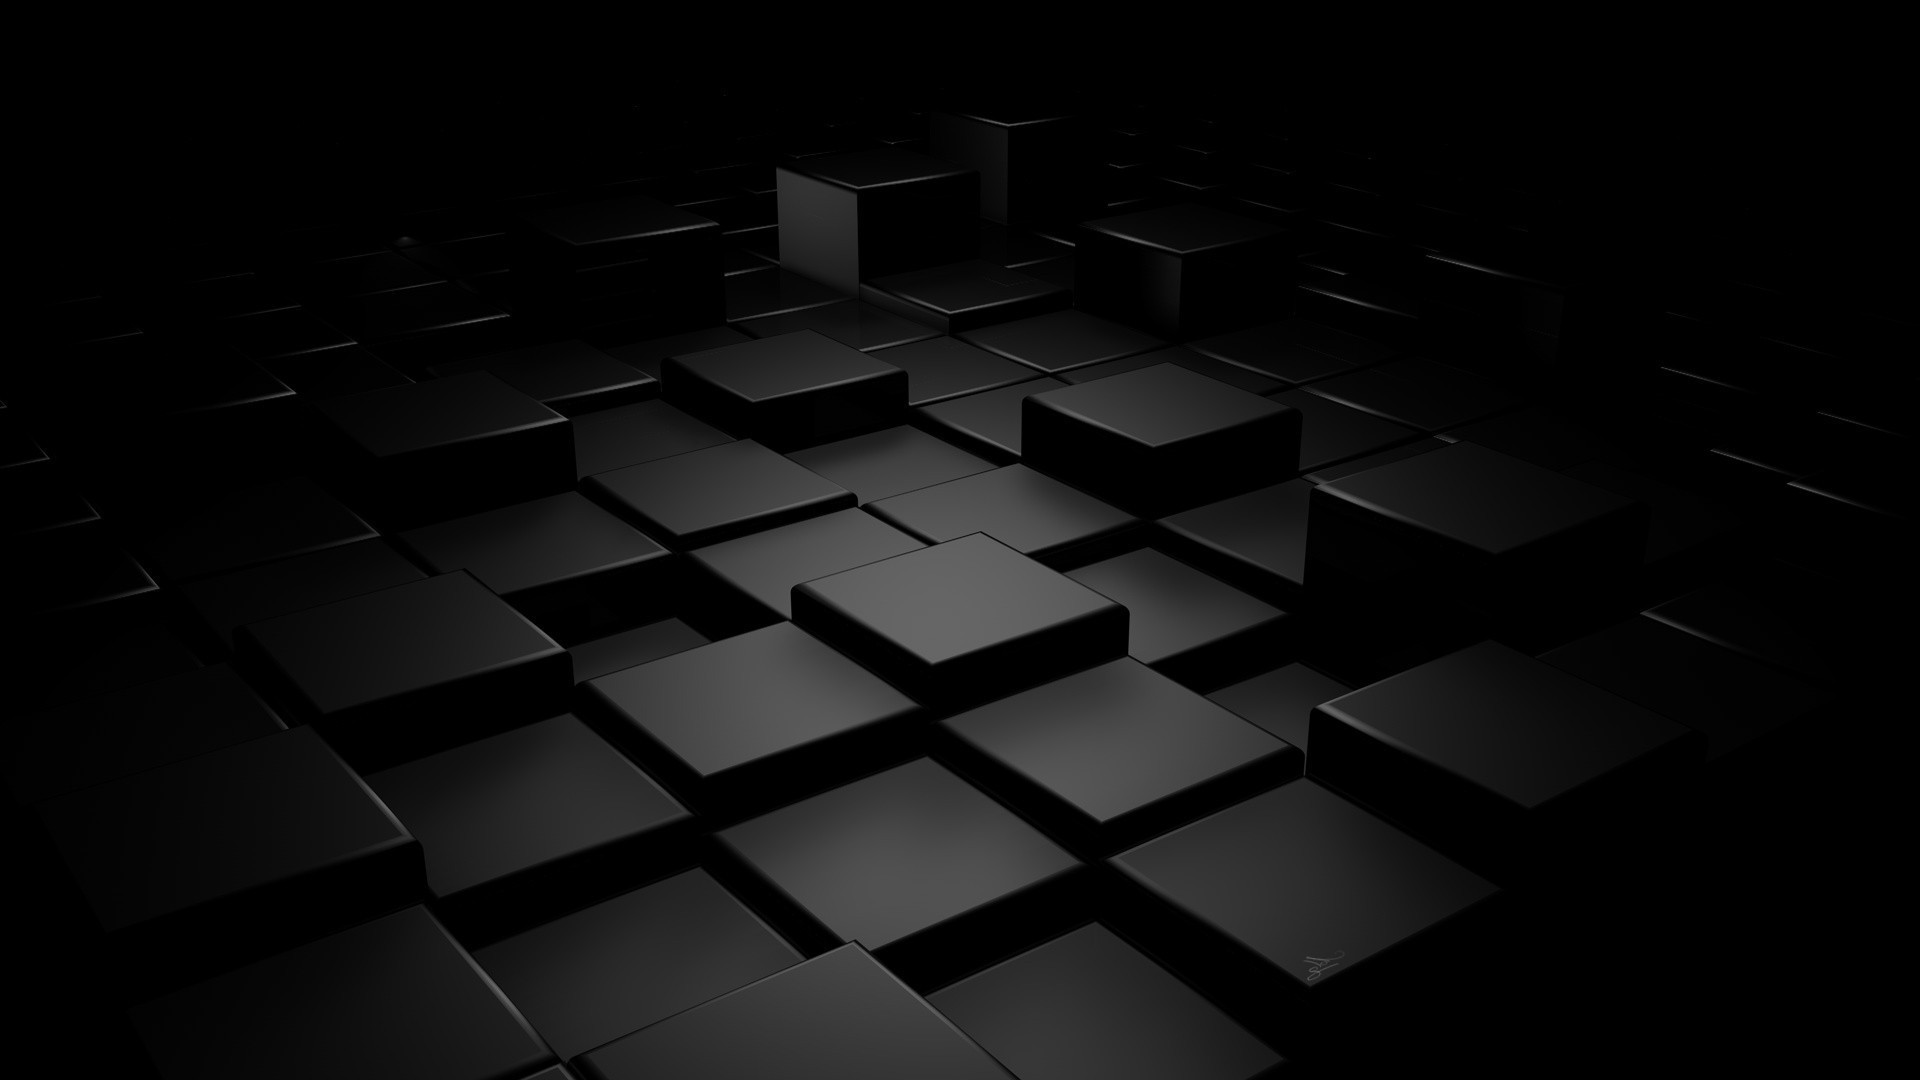 Unduh 54 Background Black Hd Pictures HD Terbaik